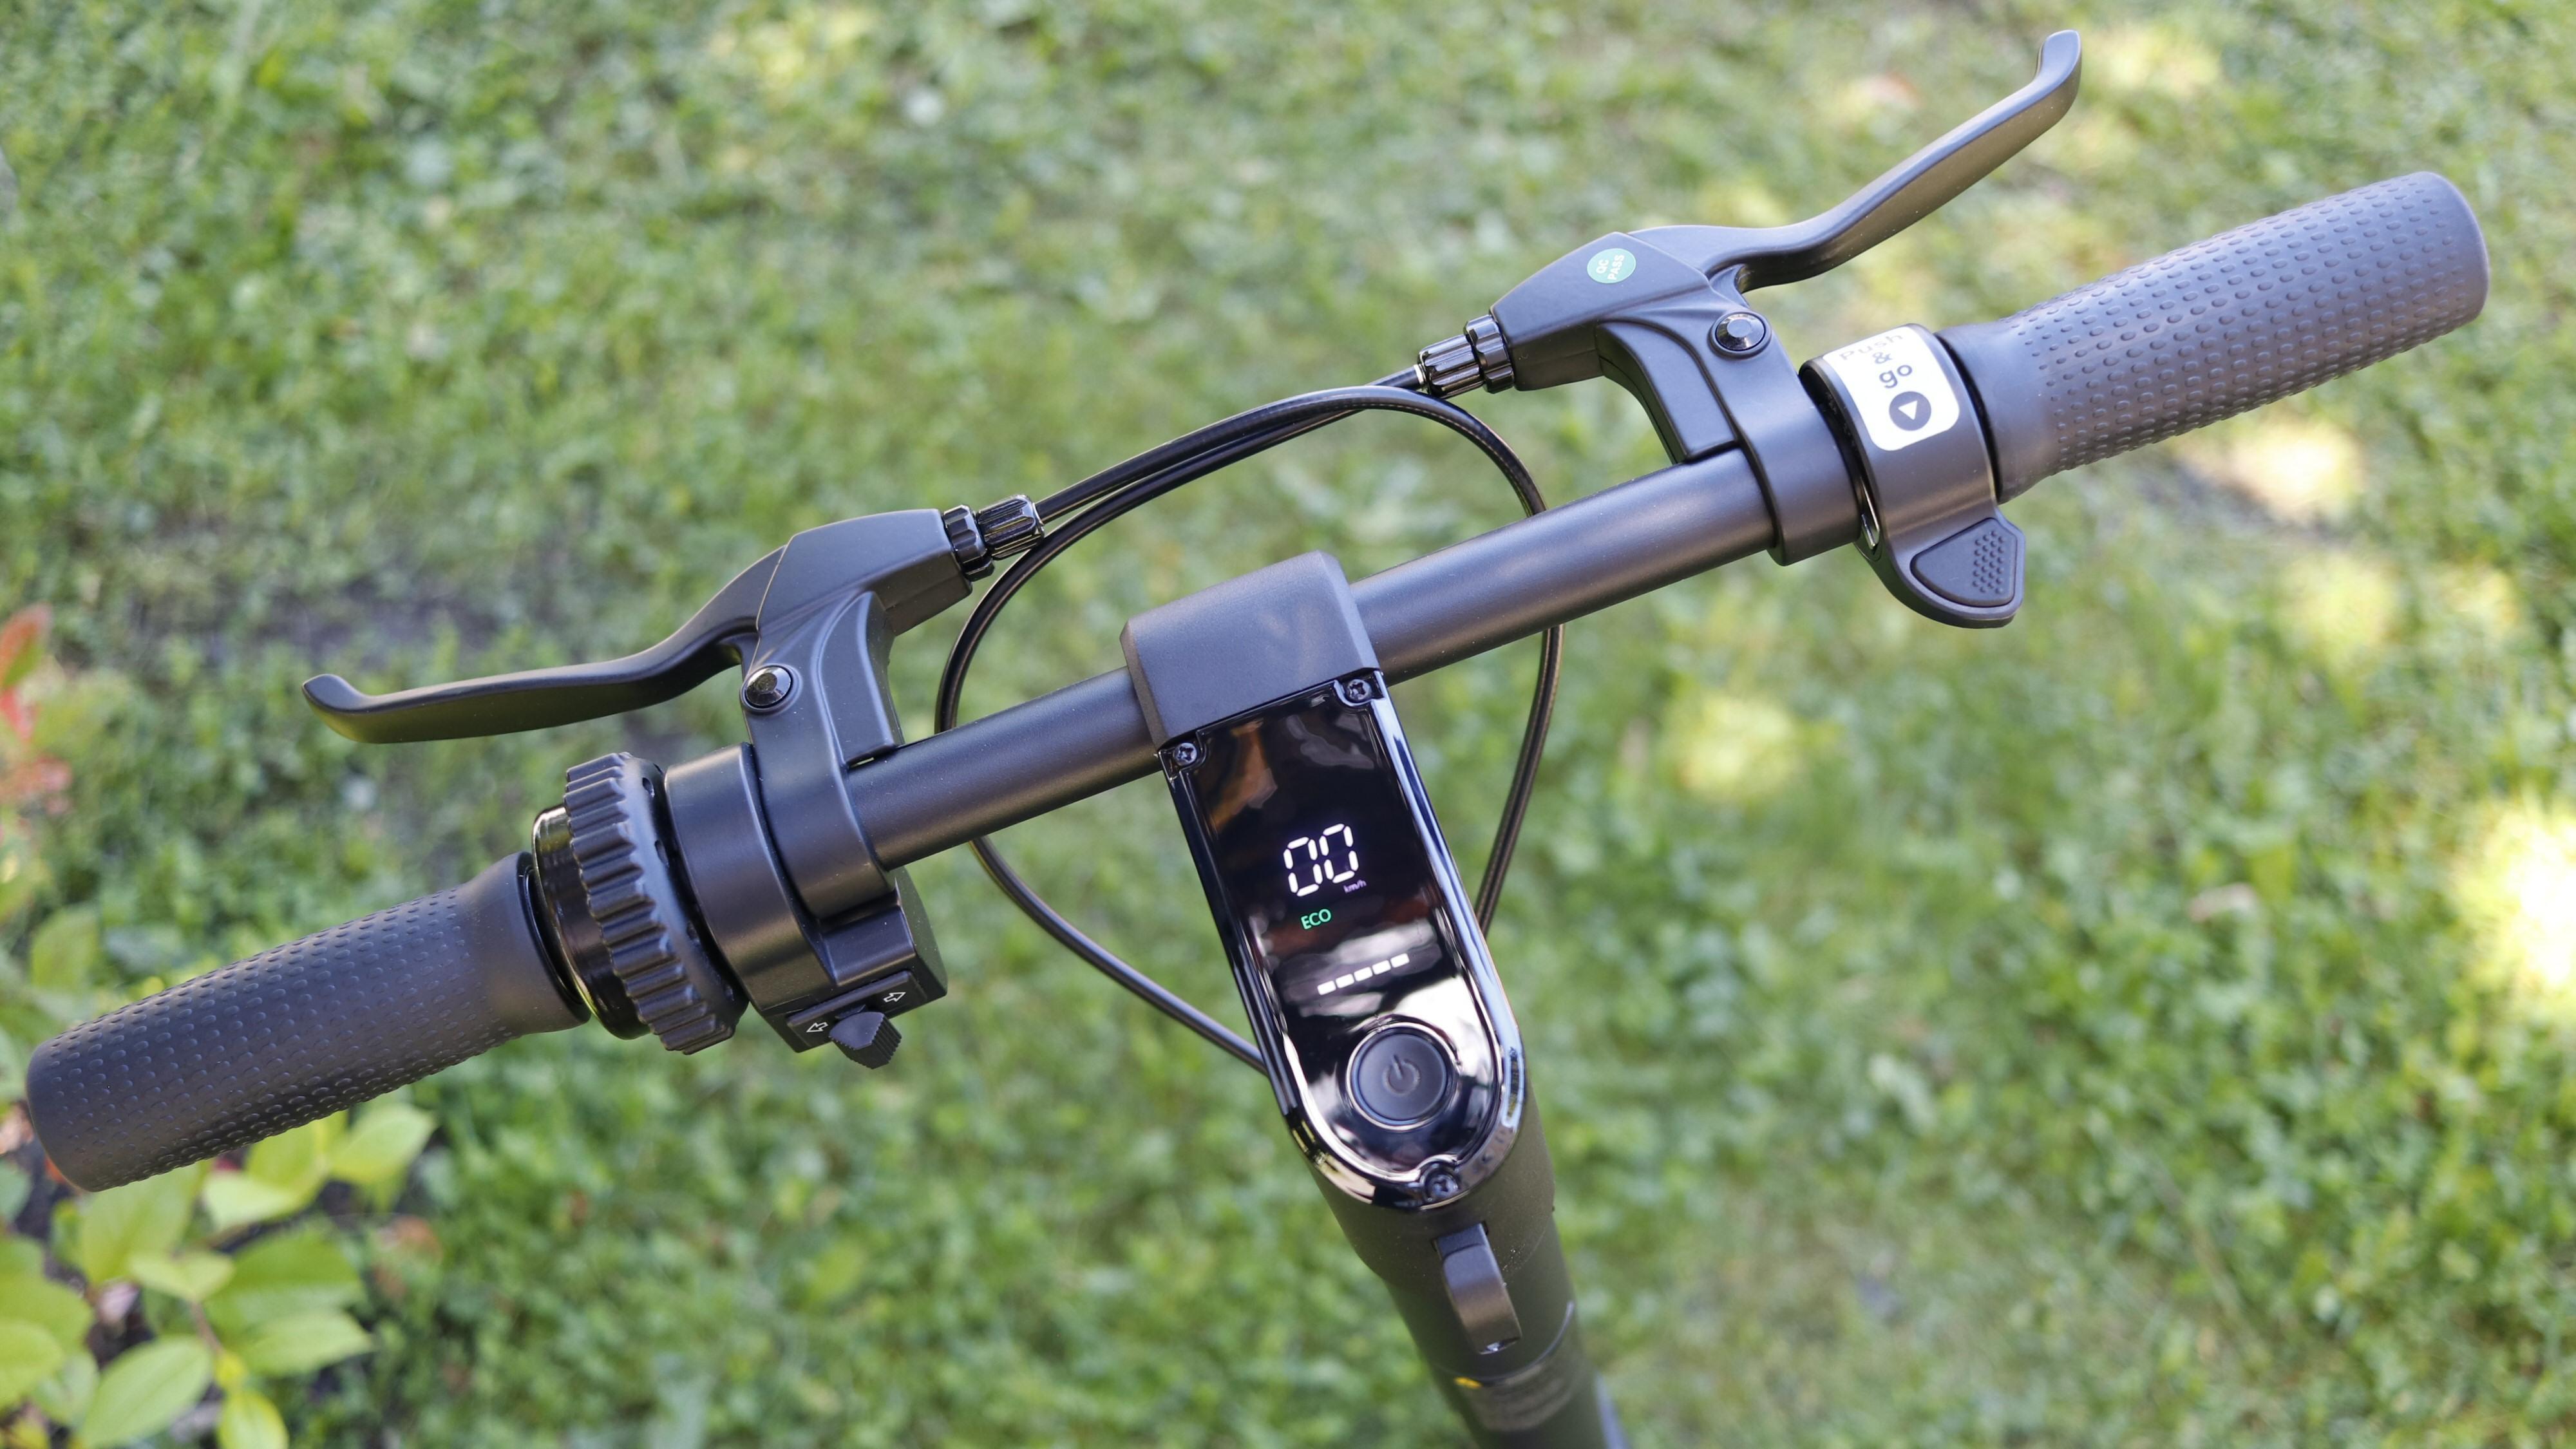 Bydue S1 har et klart og tydelig display, bjelle, blinklys og to skikkelige bremsehåndtak.